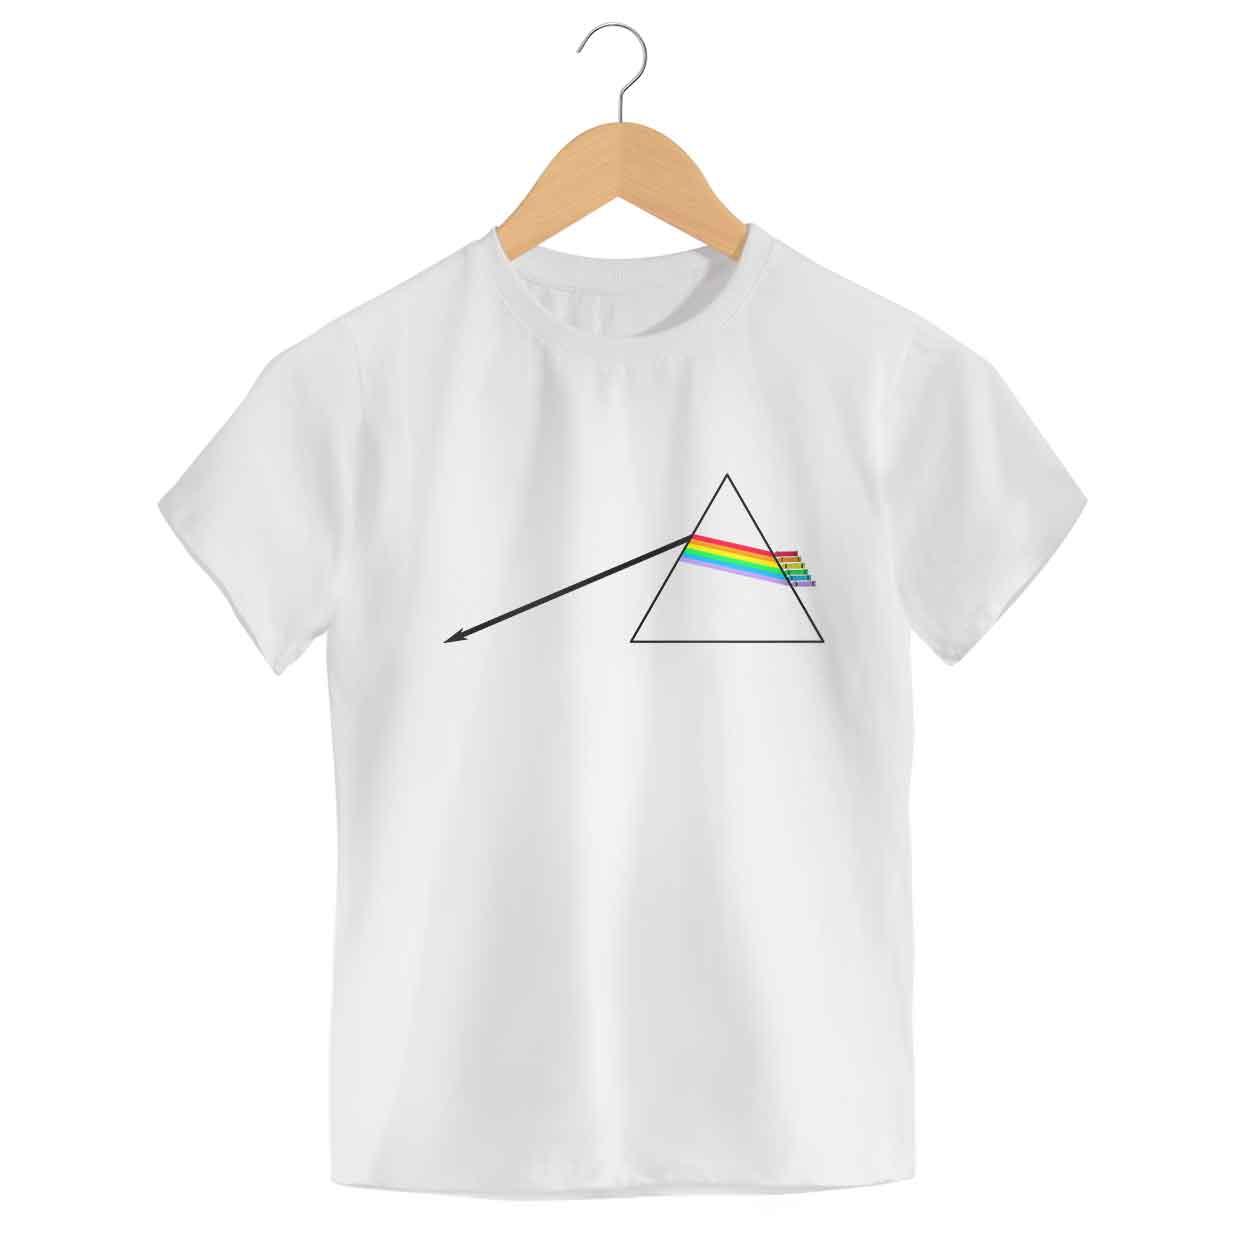 Camiseta Giz - Pink Floyd - Infantil